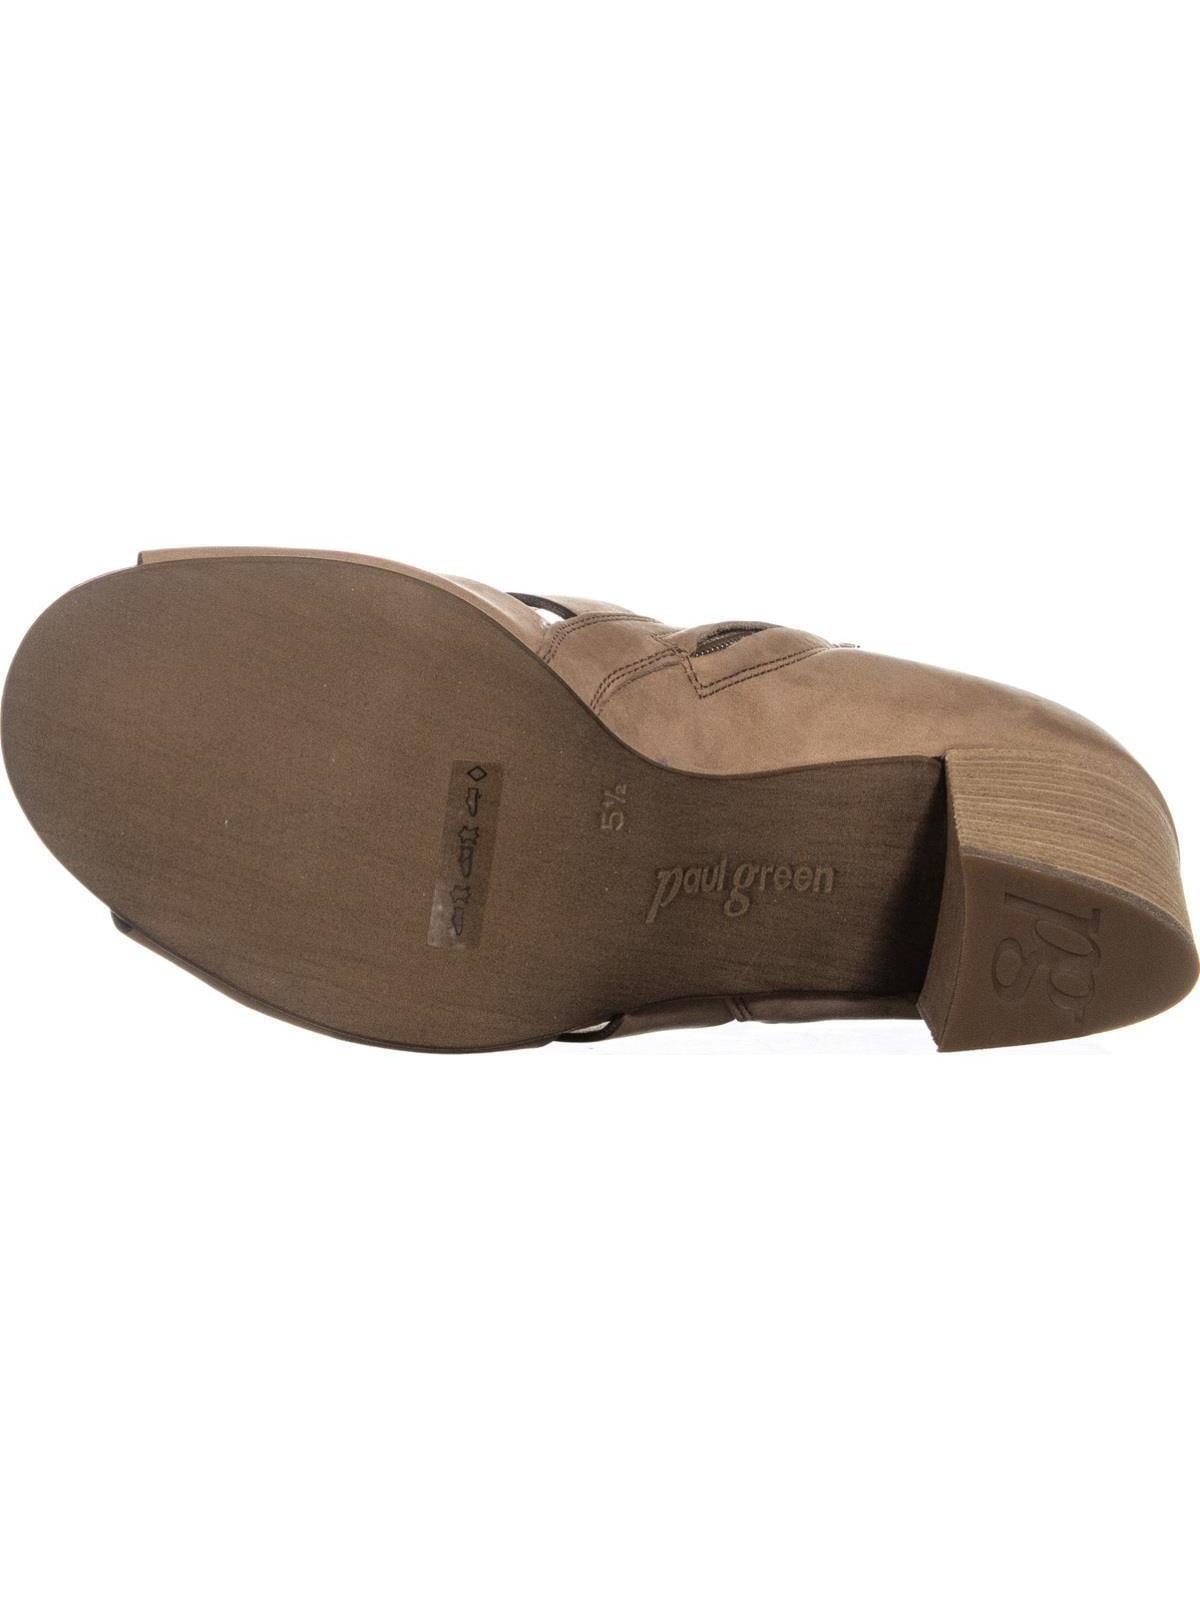 3c248b31df2 Paul Green Michelle Strappy Block Heel Sandals